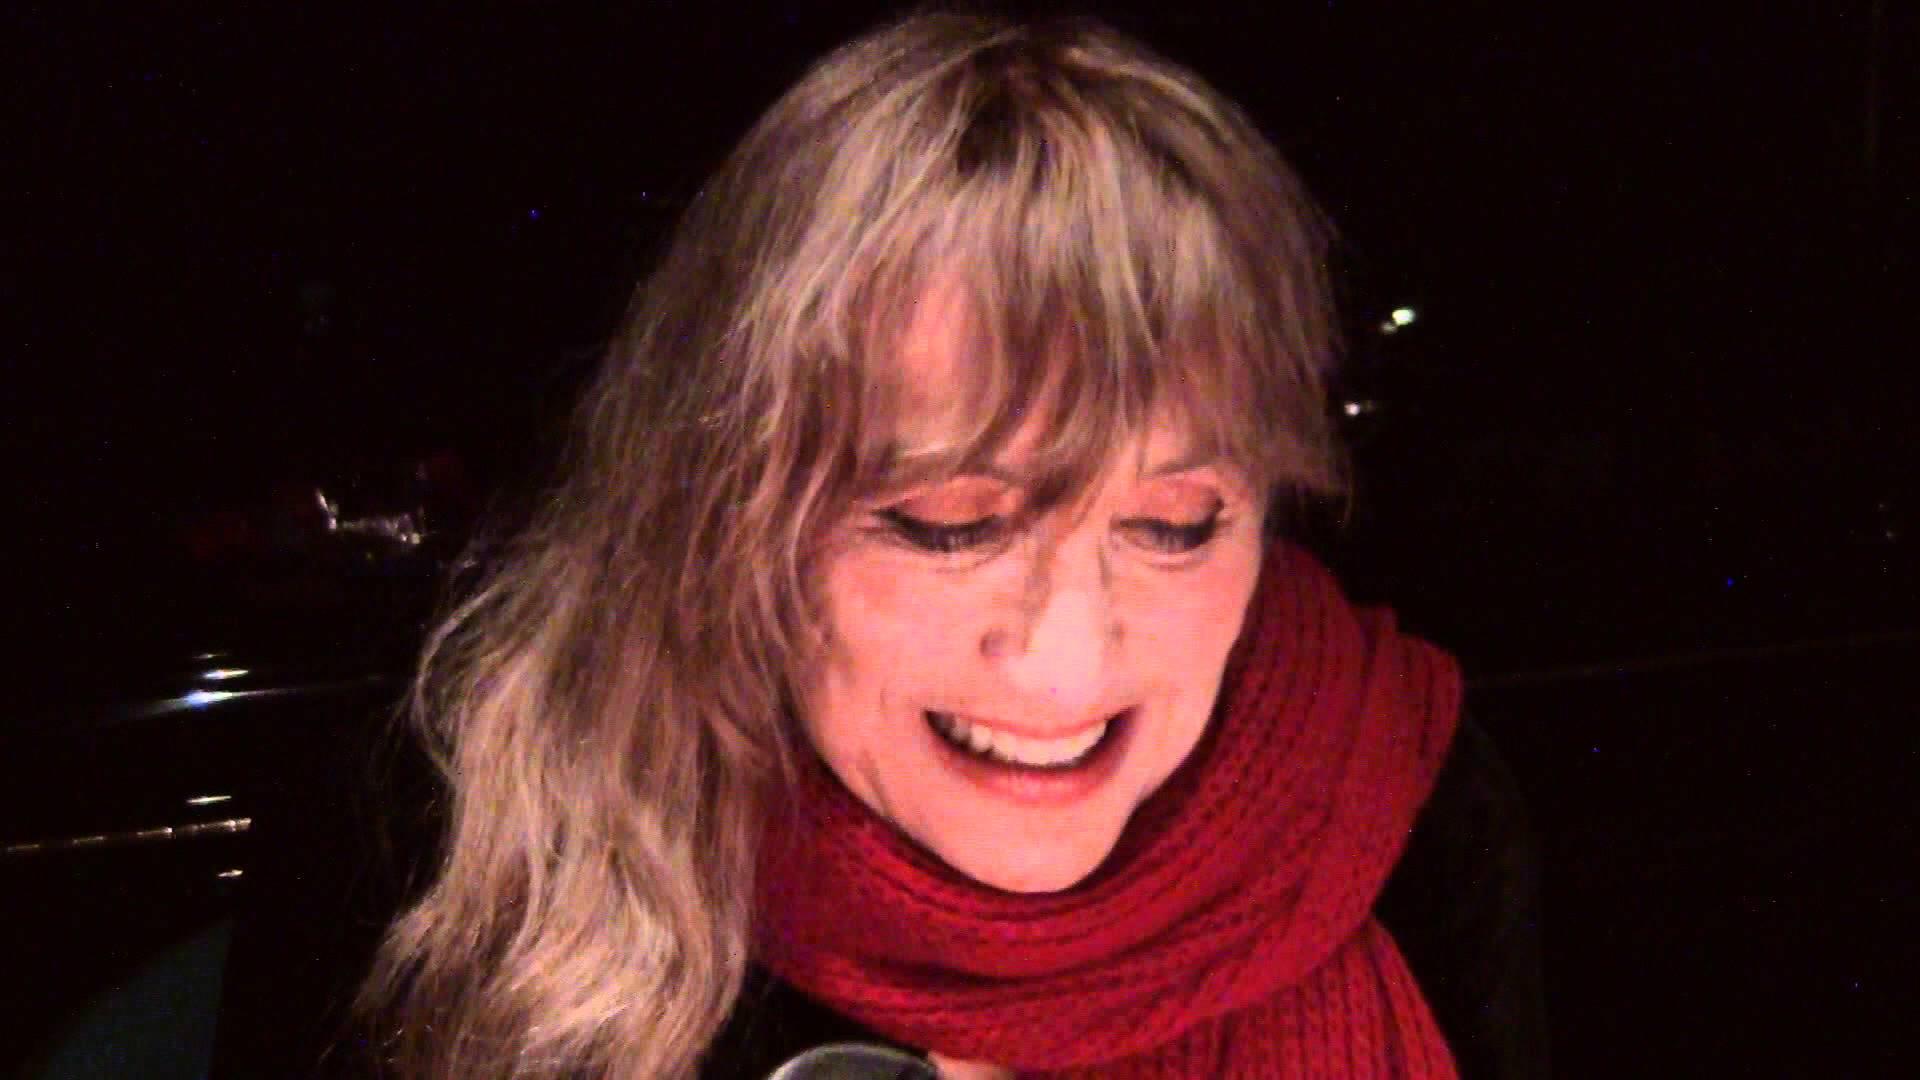 Watch Piera Degli Esposti video